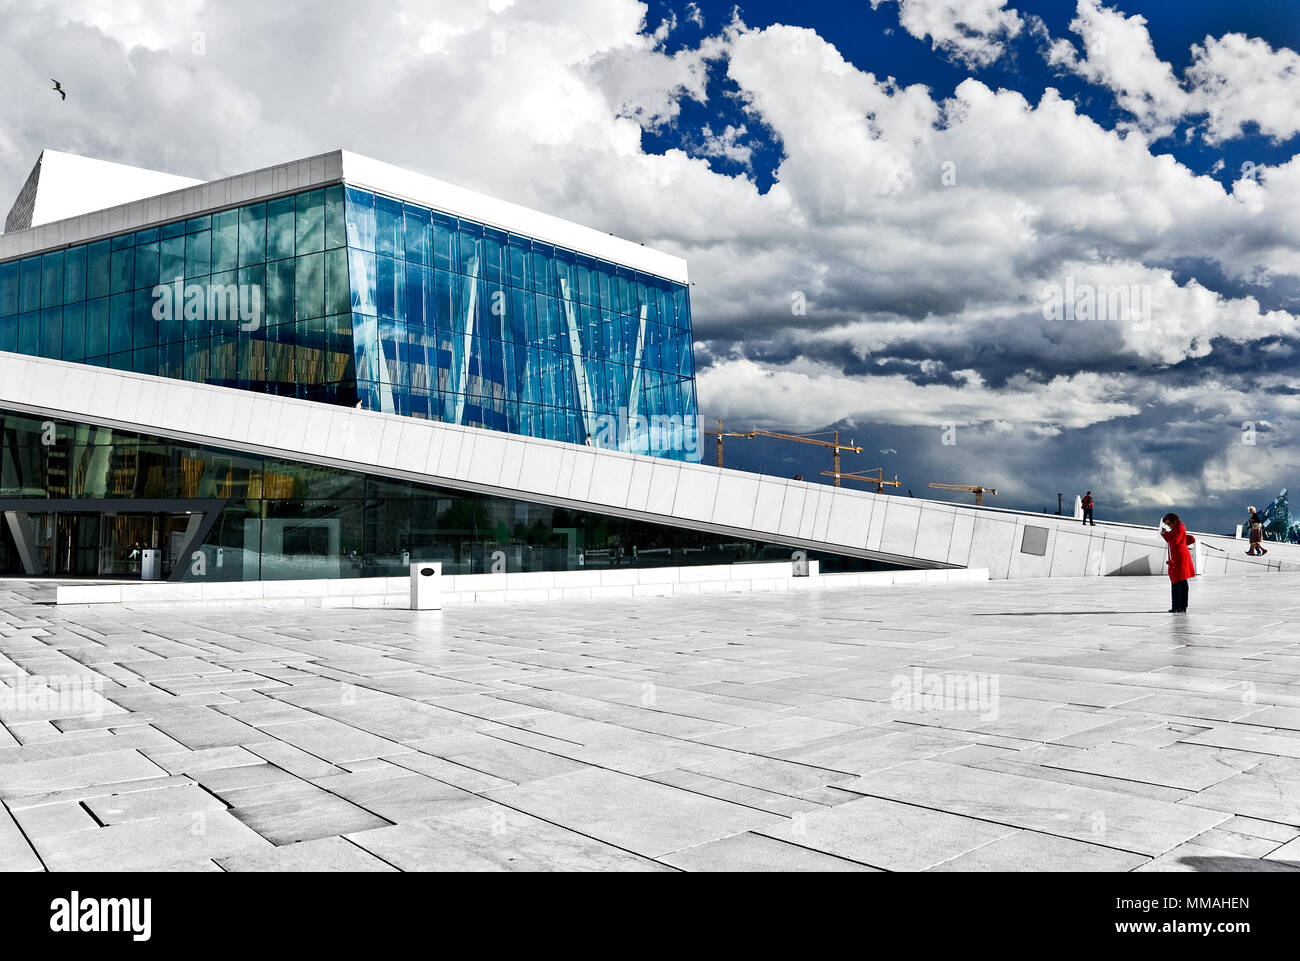 Norway - Oslo, Opera House area - Stock Image